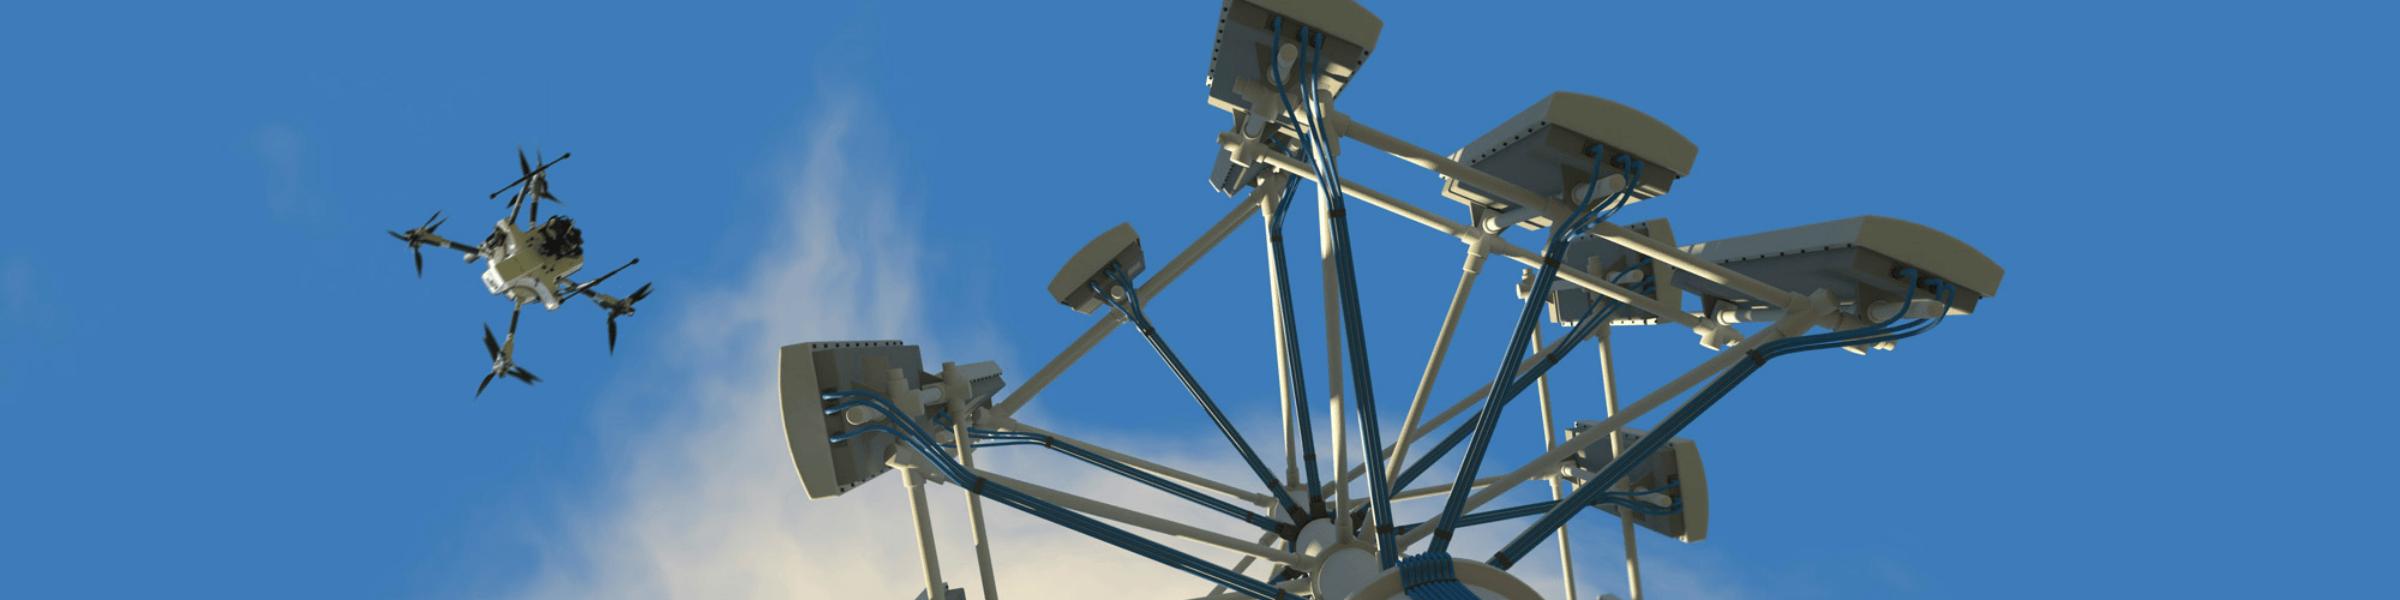 Altus-Intelligence-Drone-Major-Consultancy-Services-Solutions-Hub